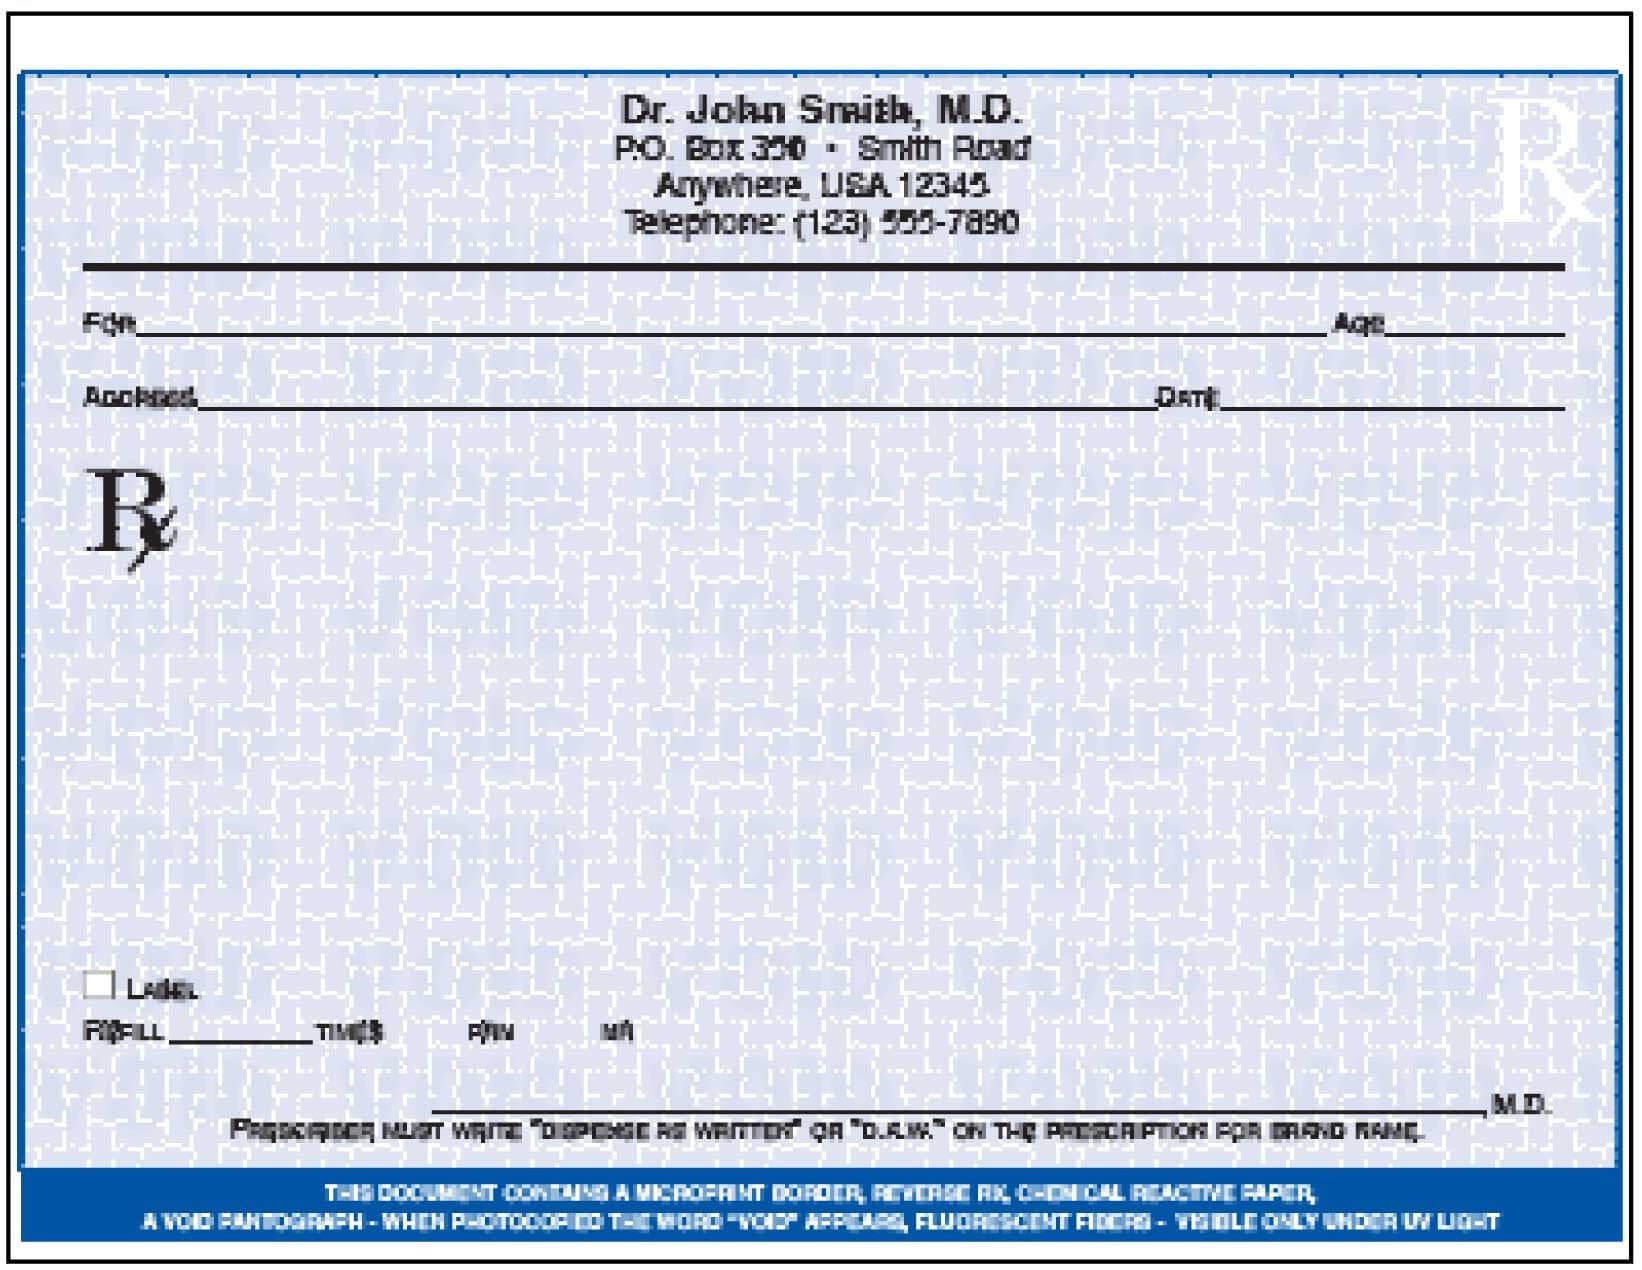 005 Doctor Prescription Pad Template Microsoft Word Free With Regard To Doctors Prescription Template Word